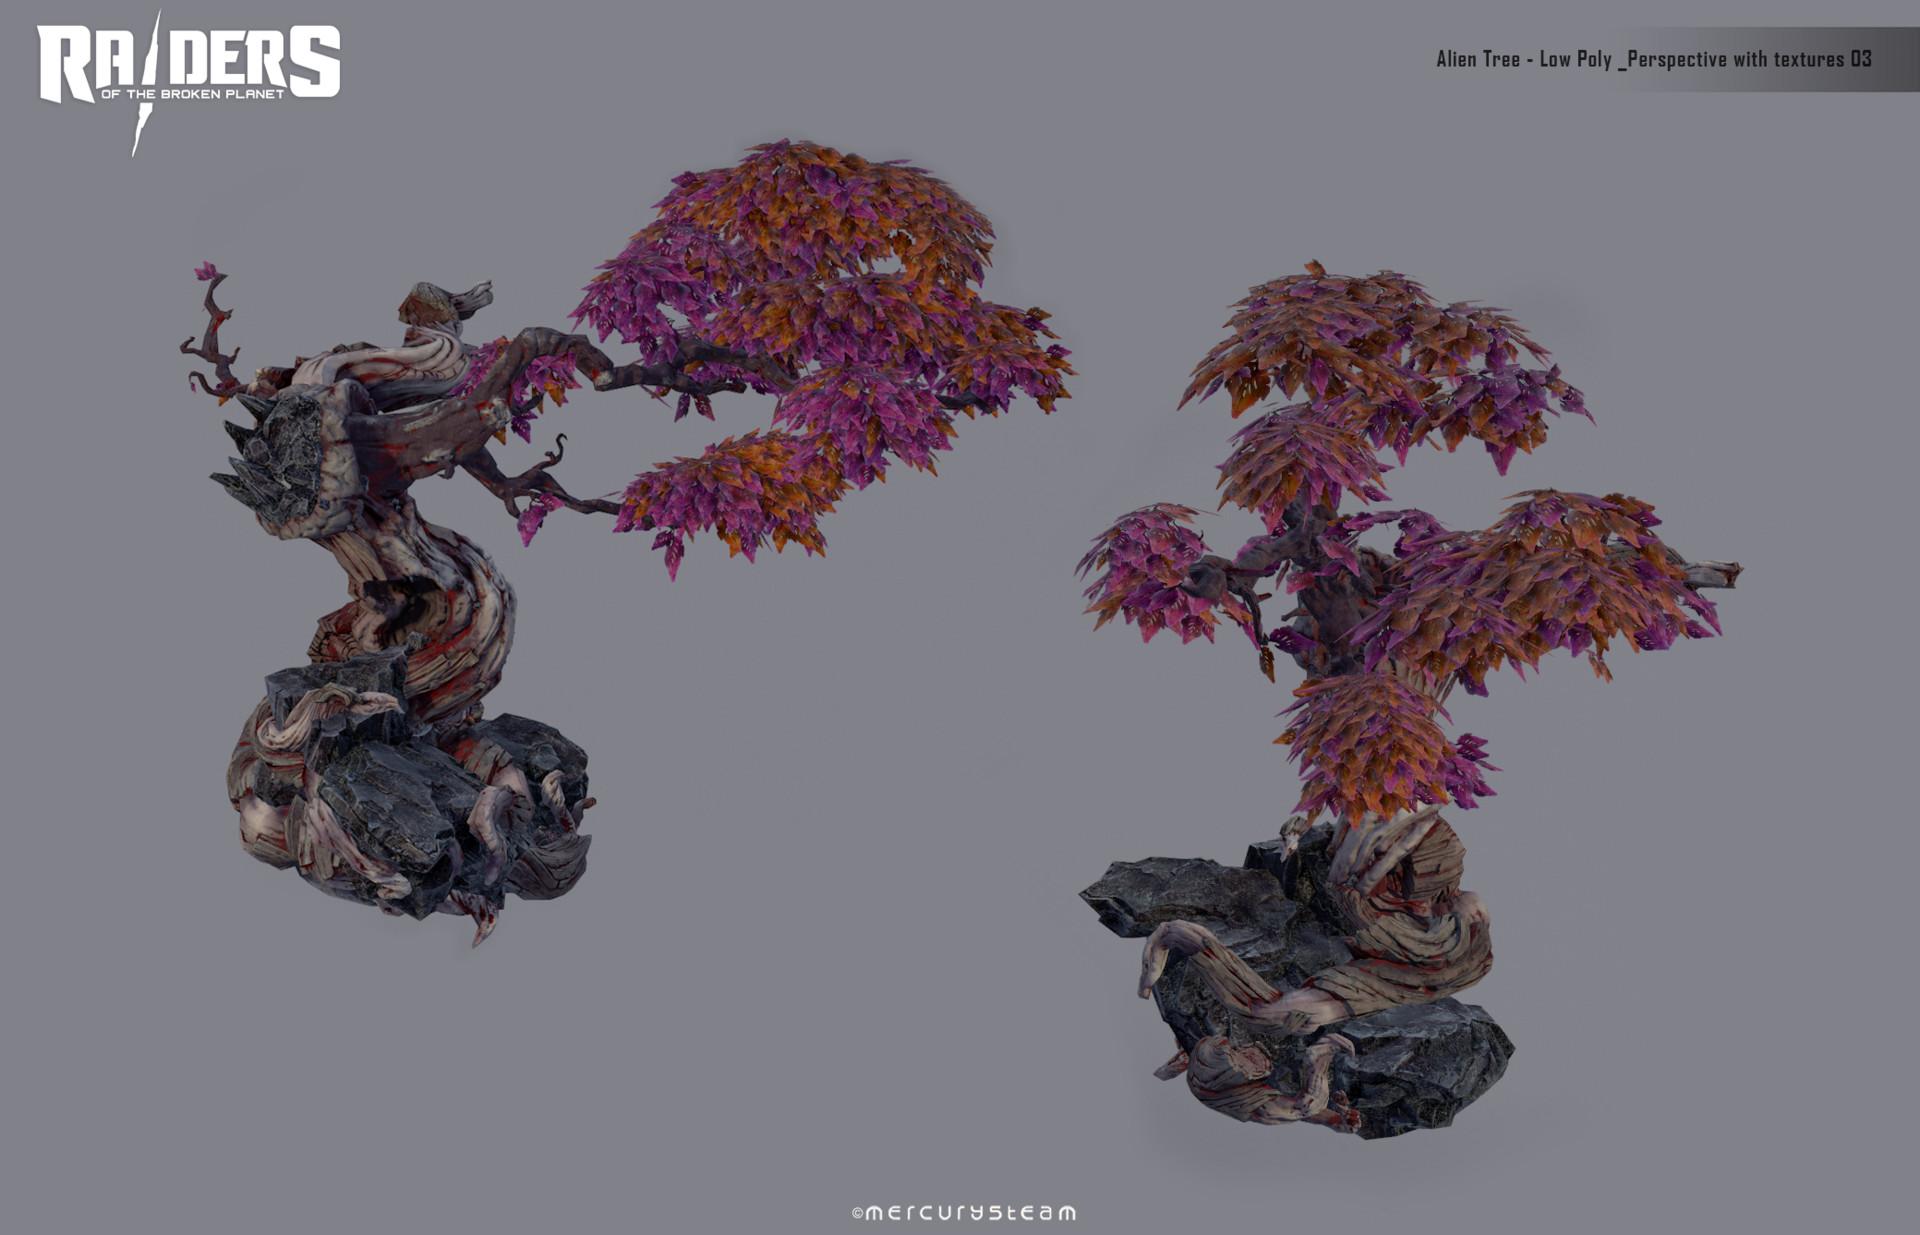 ArtStation - Alien Tree, Xose Geada